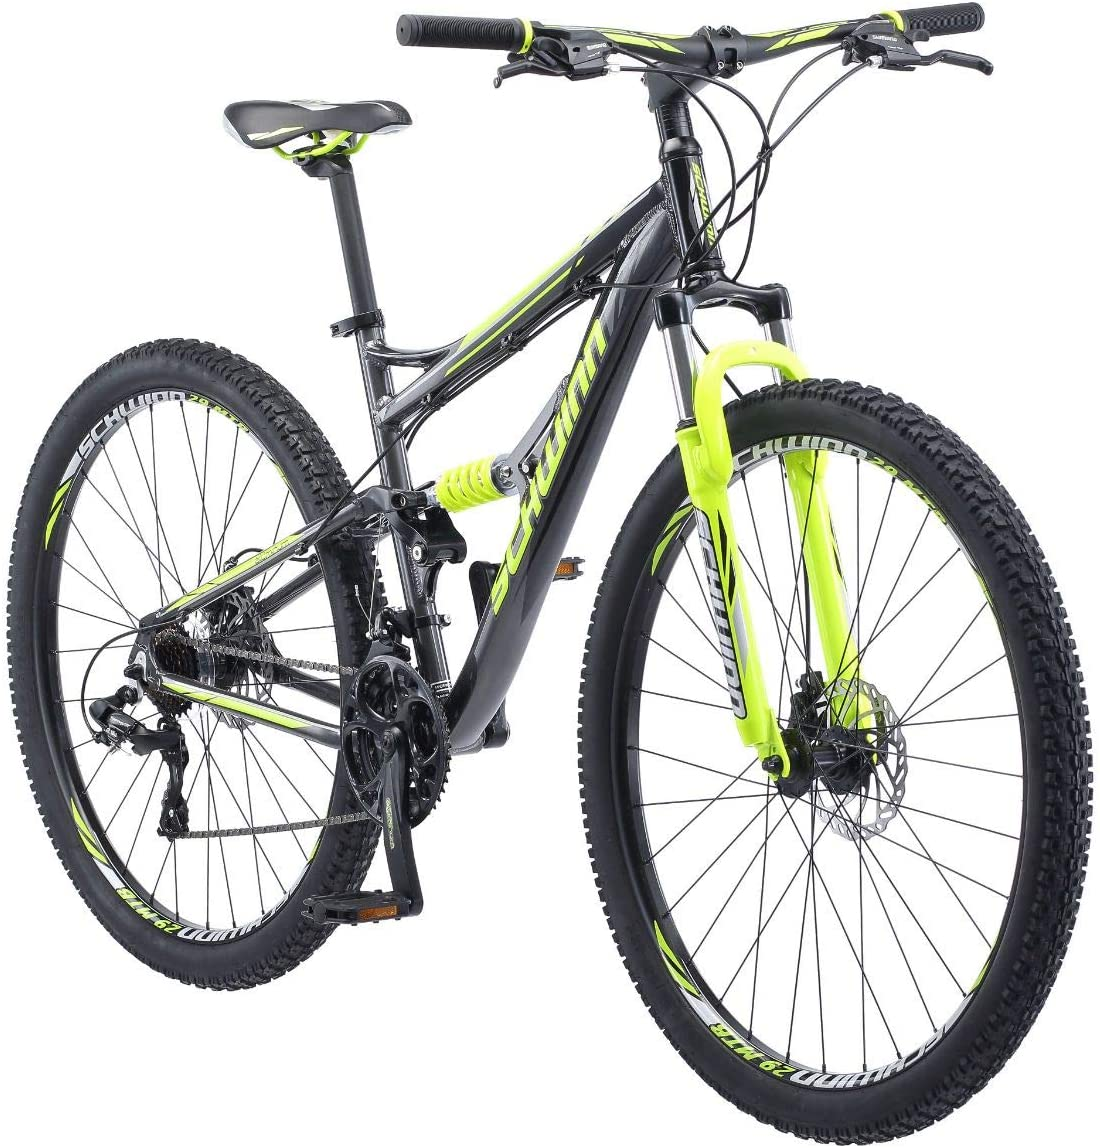 best full suspension mountain bike under 2000: Schwinn Traxion Mountain Bike